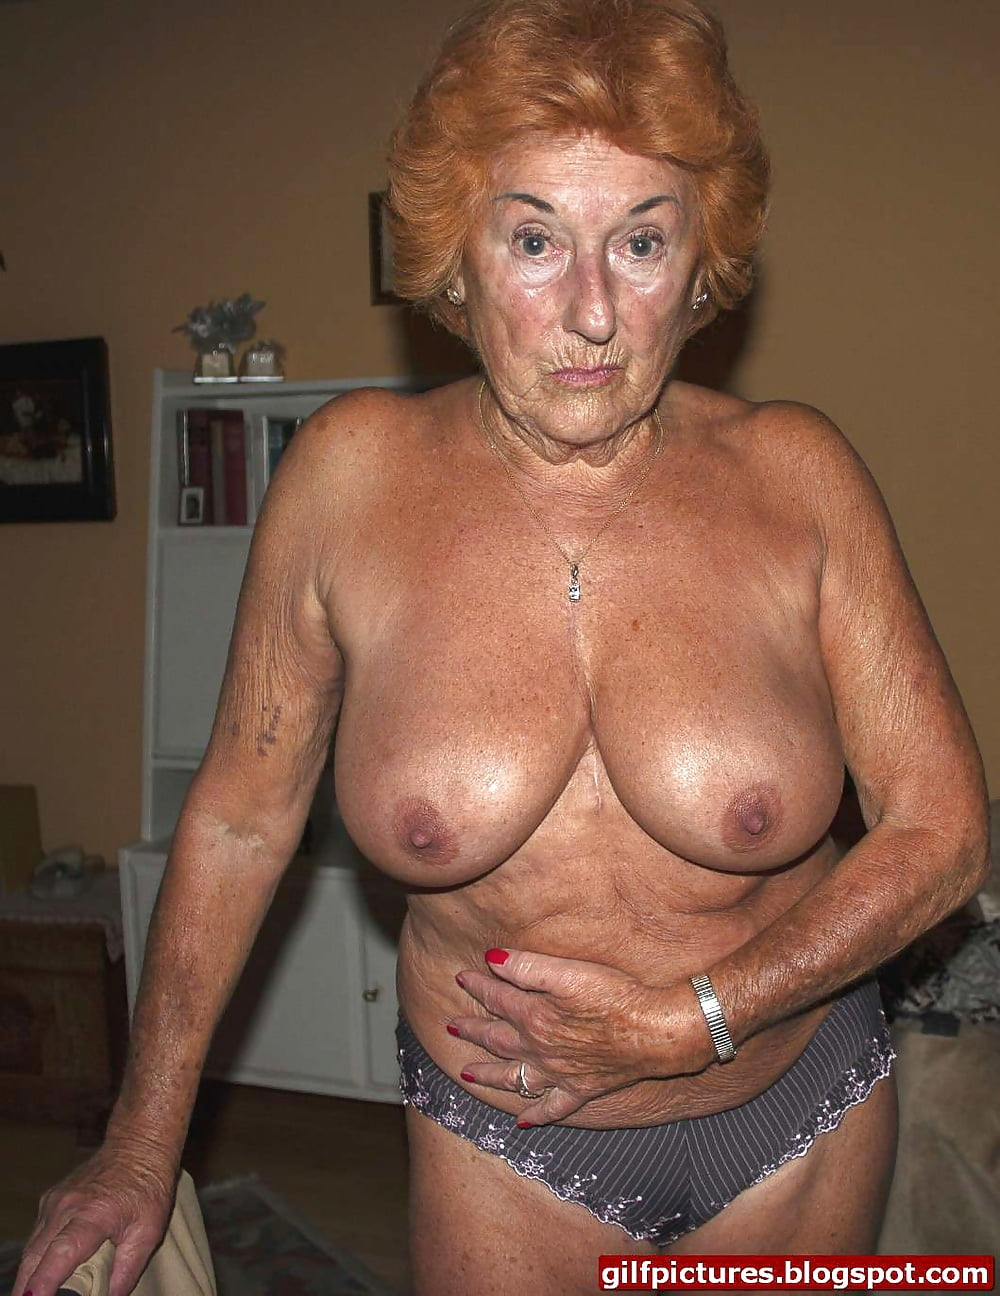 Hottest grandma ever naked — photo 14